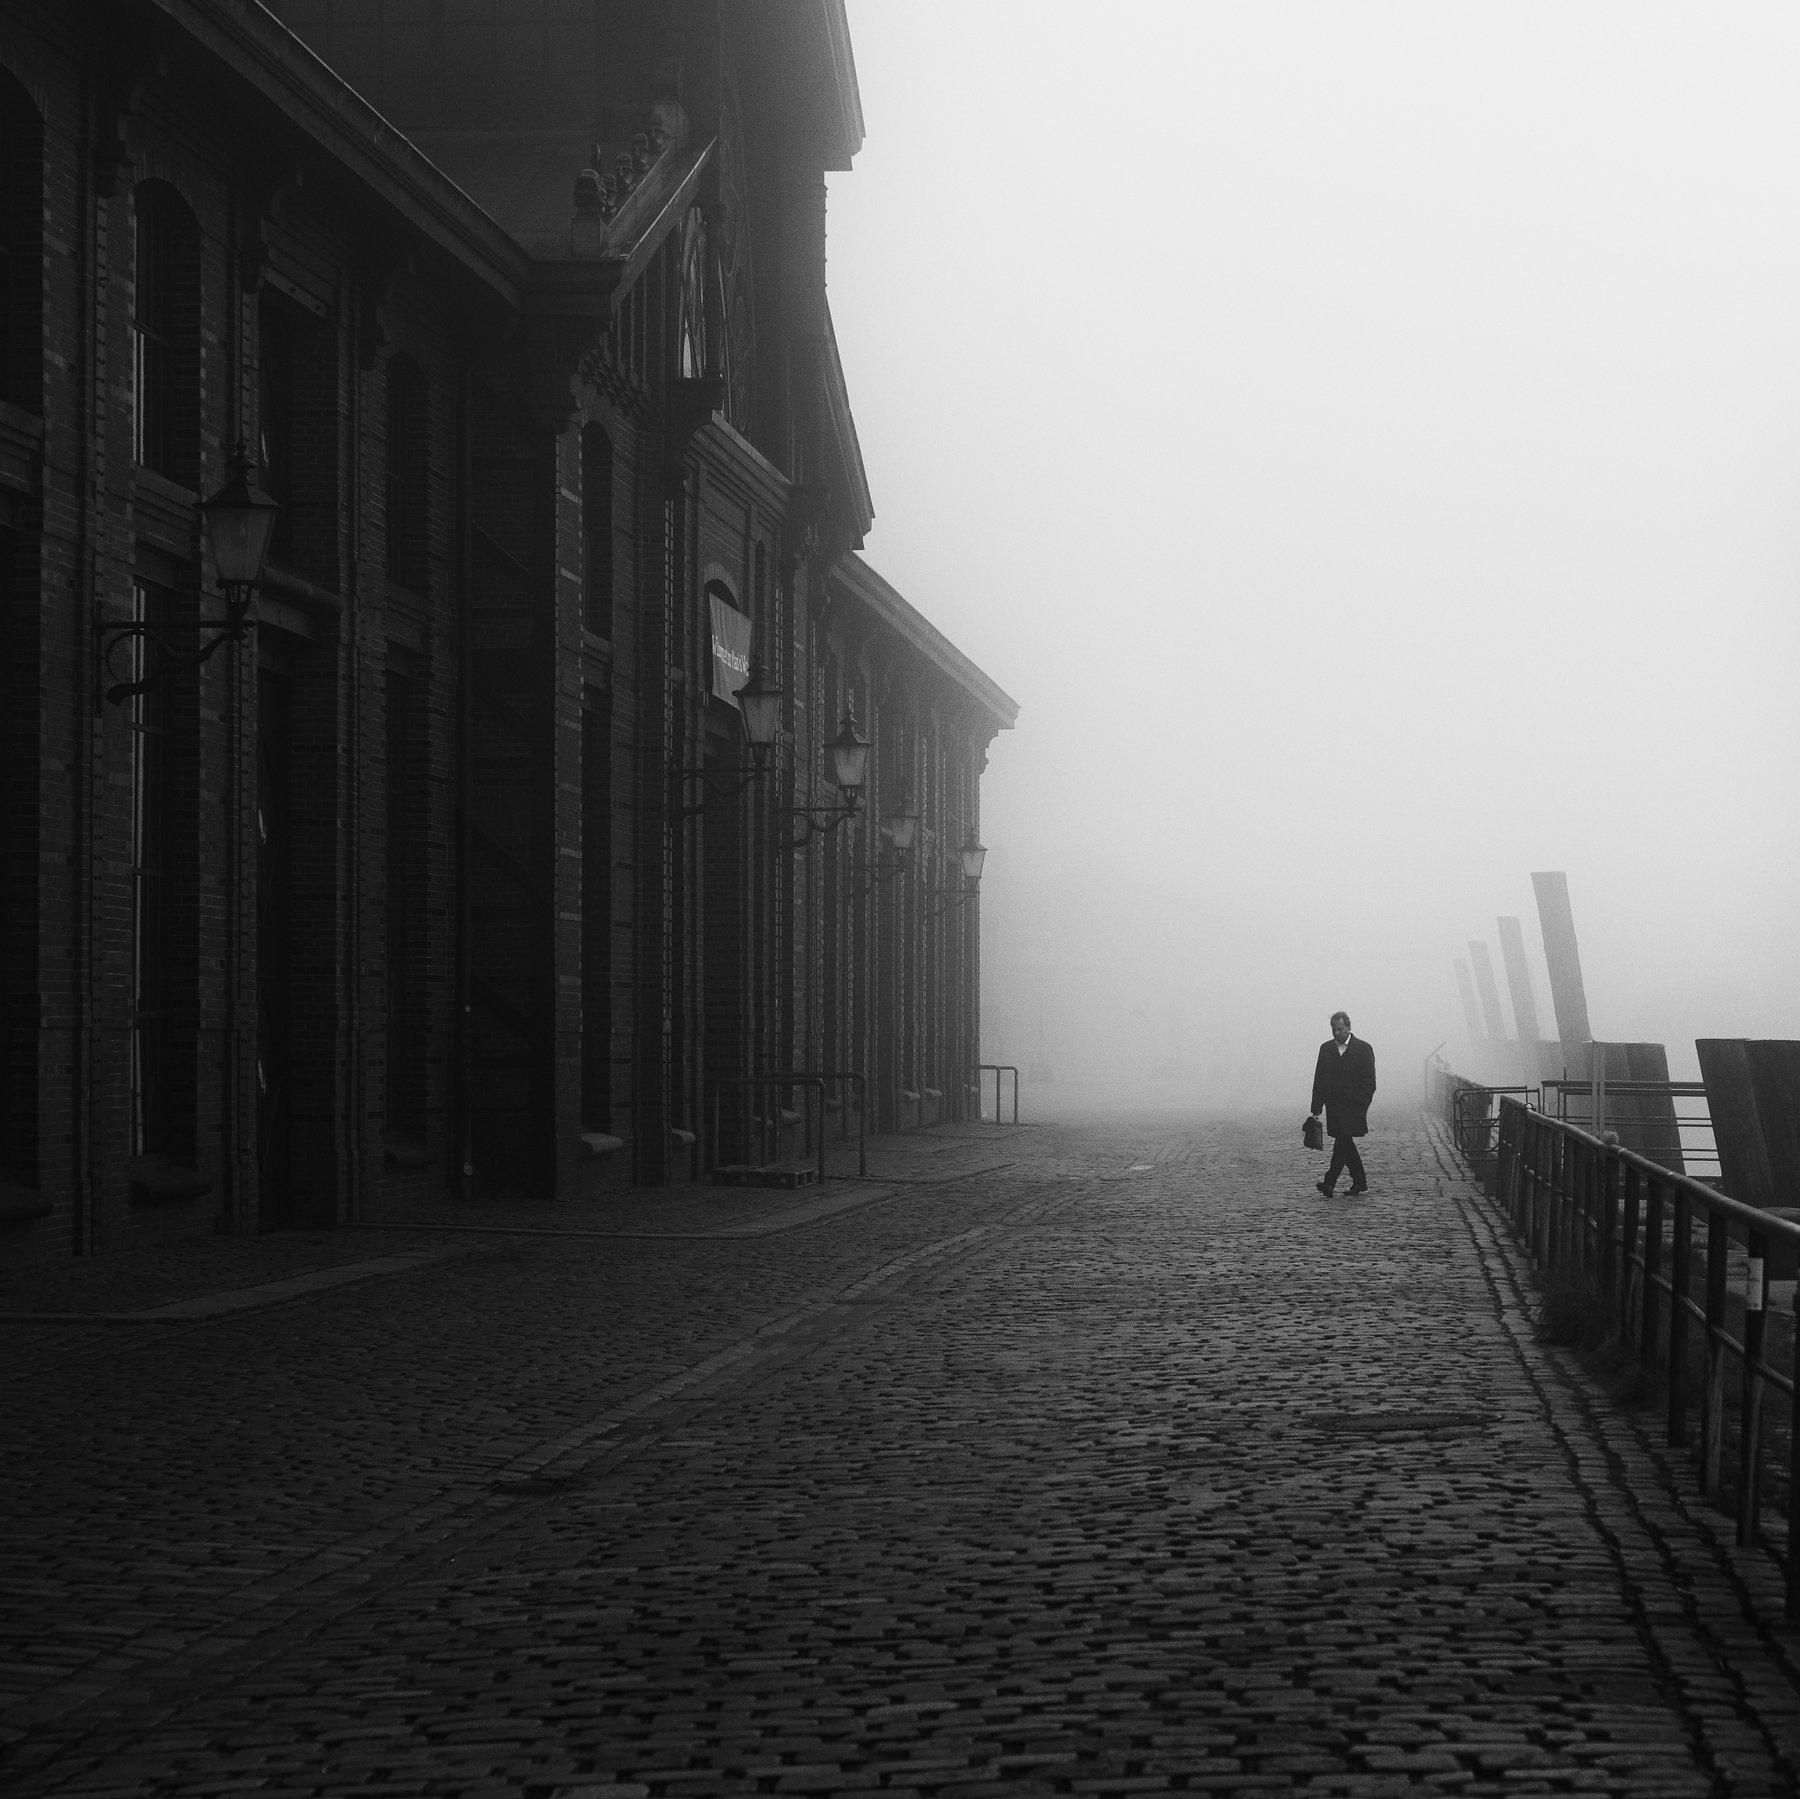 fog, mist, haze, person, street, urban, Alexander Schönberg